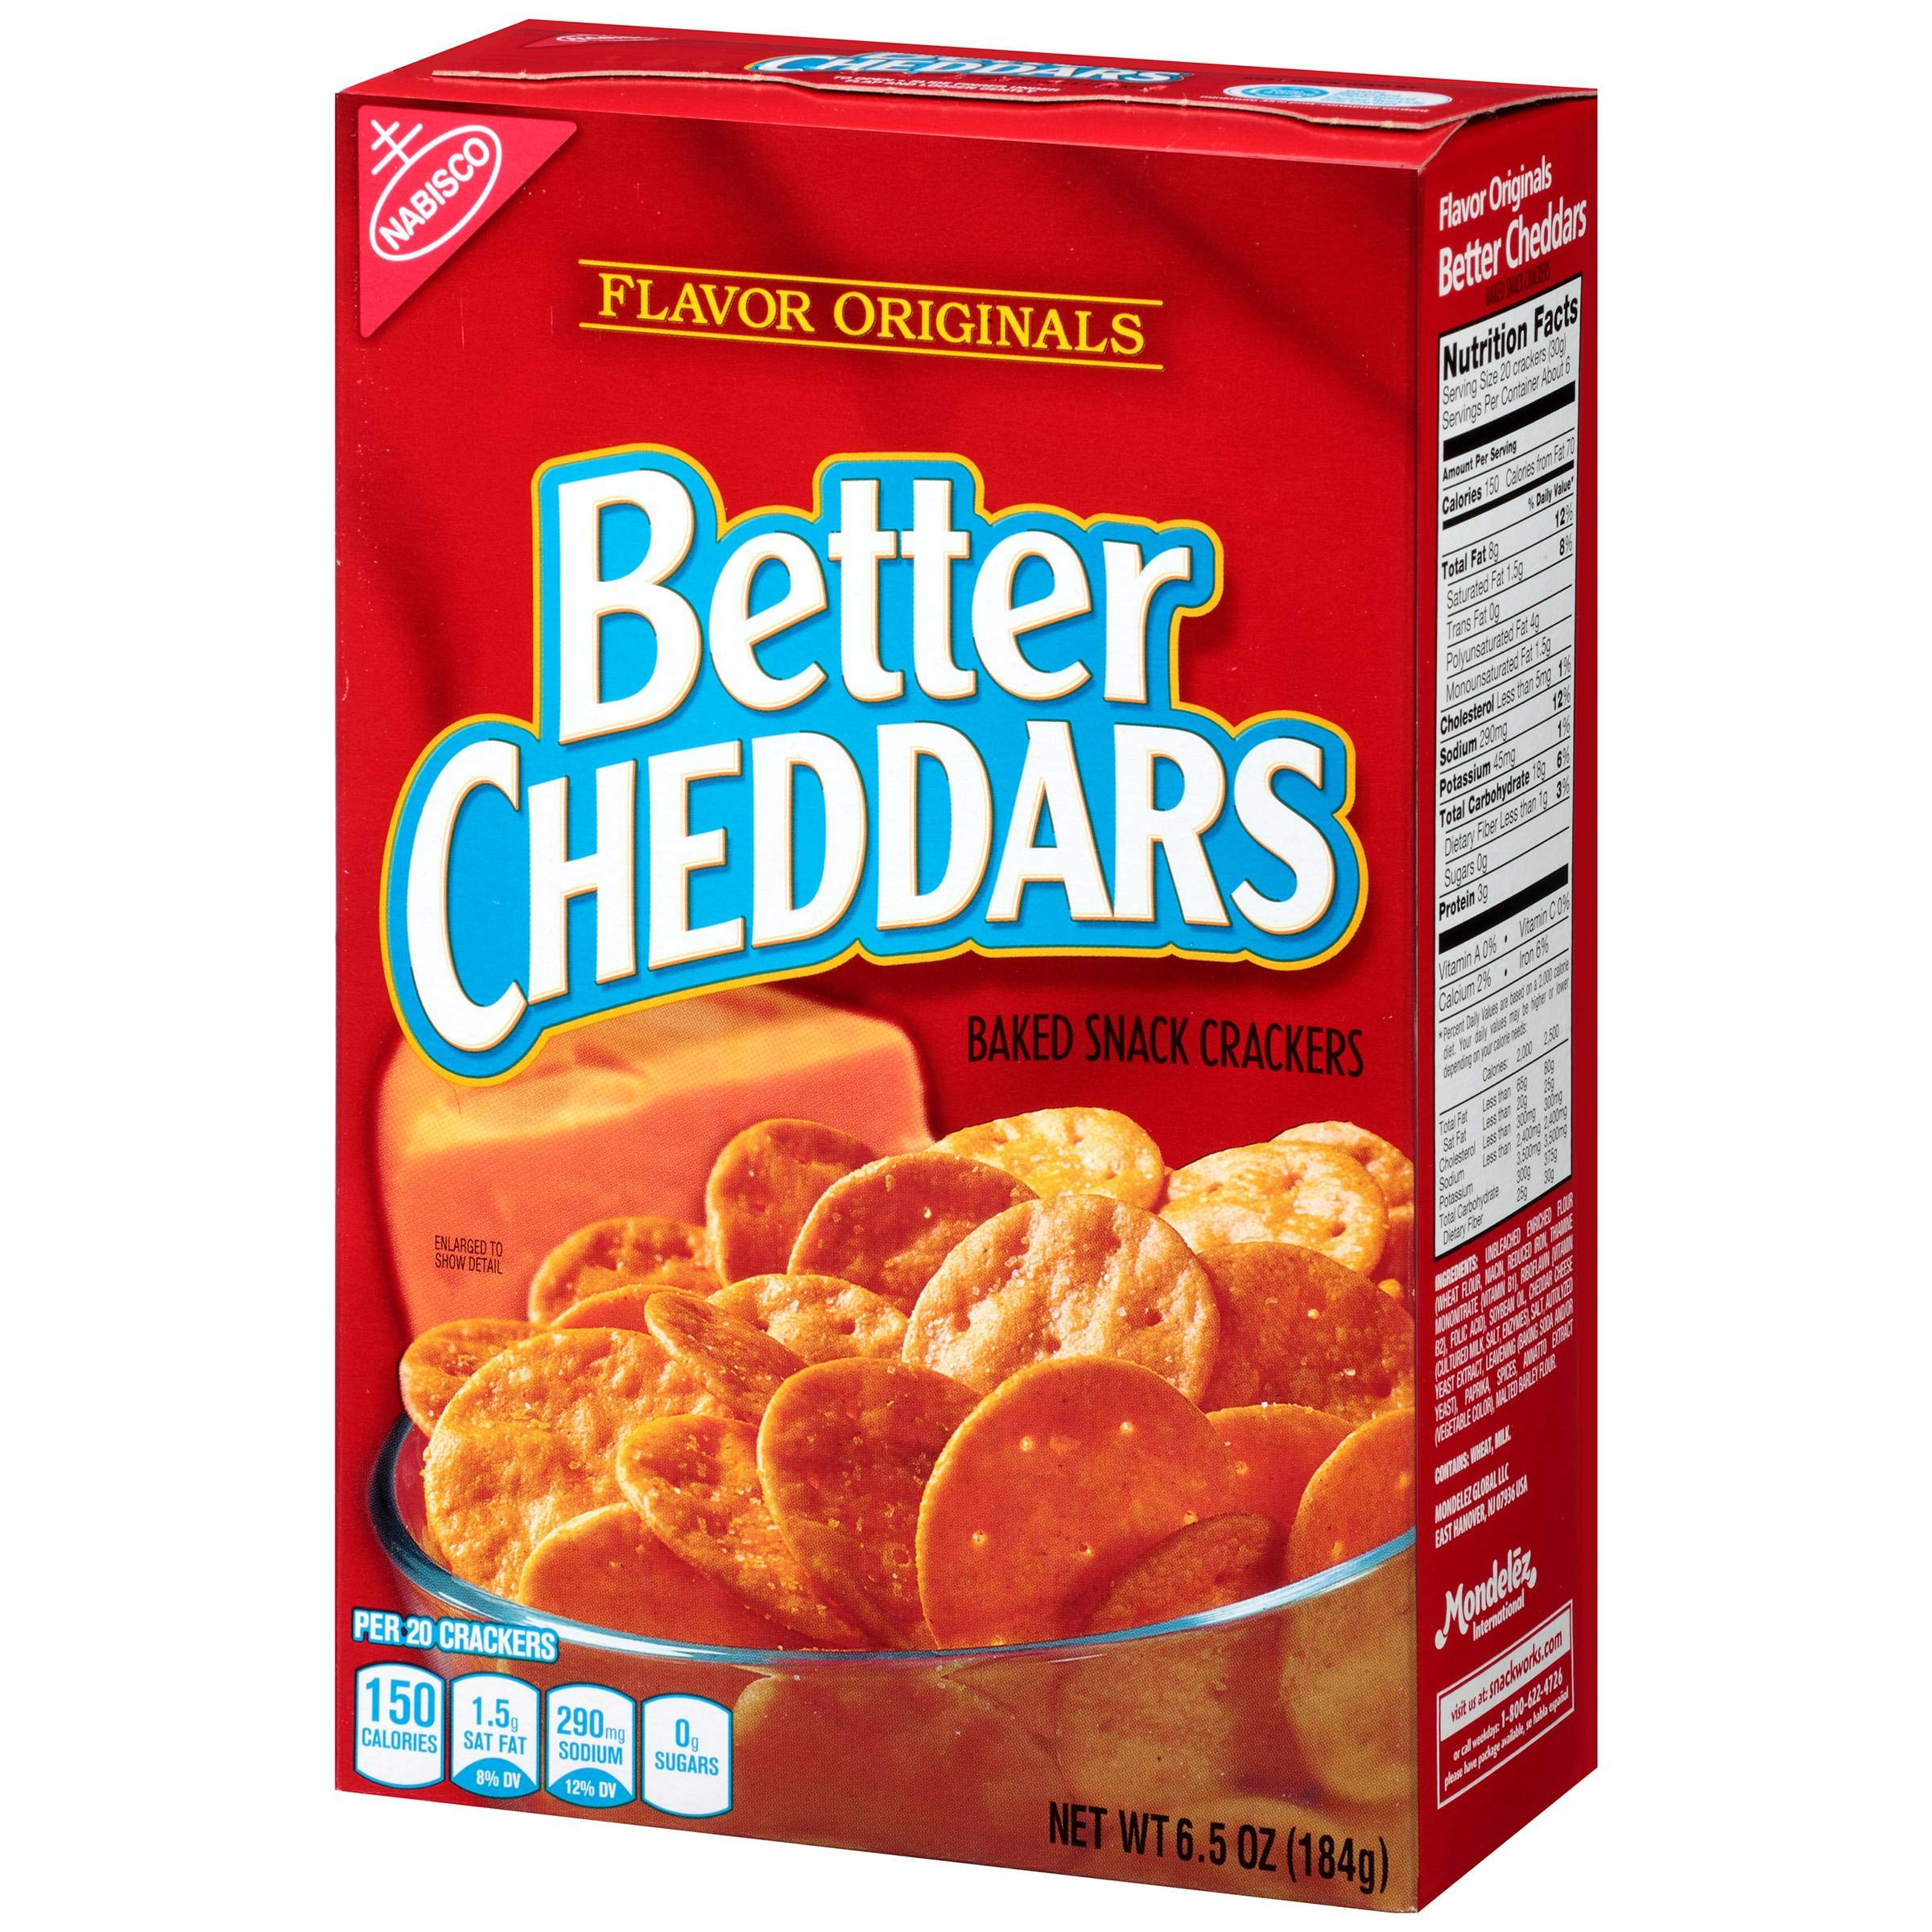 Flavor Originals Better Cheddars Baked Snack Cracker, 6.5 Ounce -- 6 per case. by Mondelez